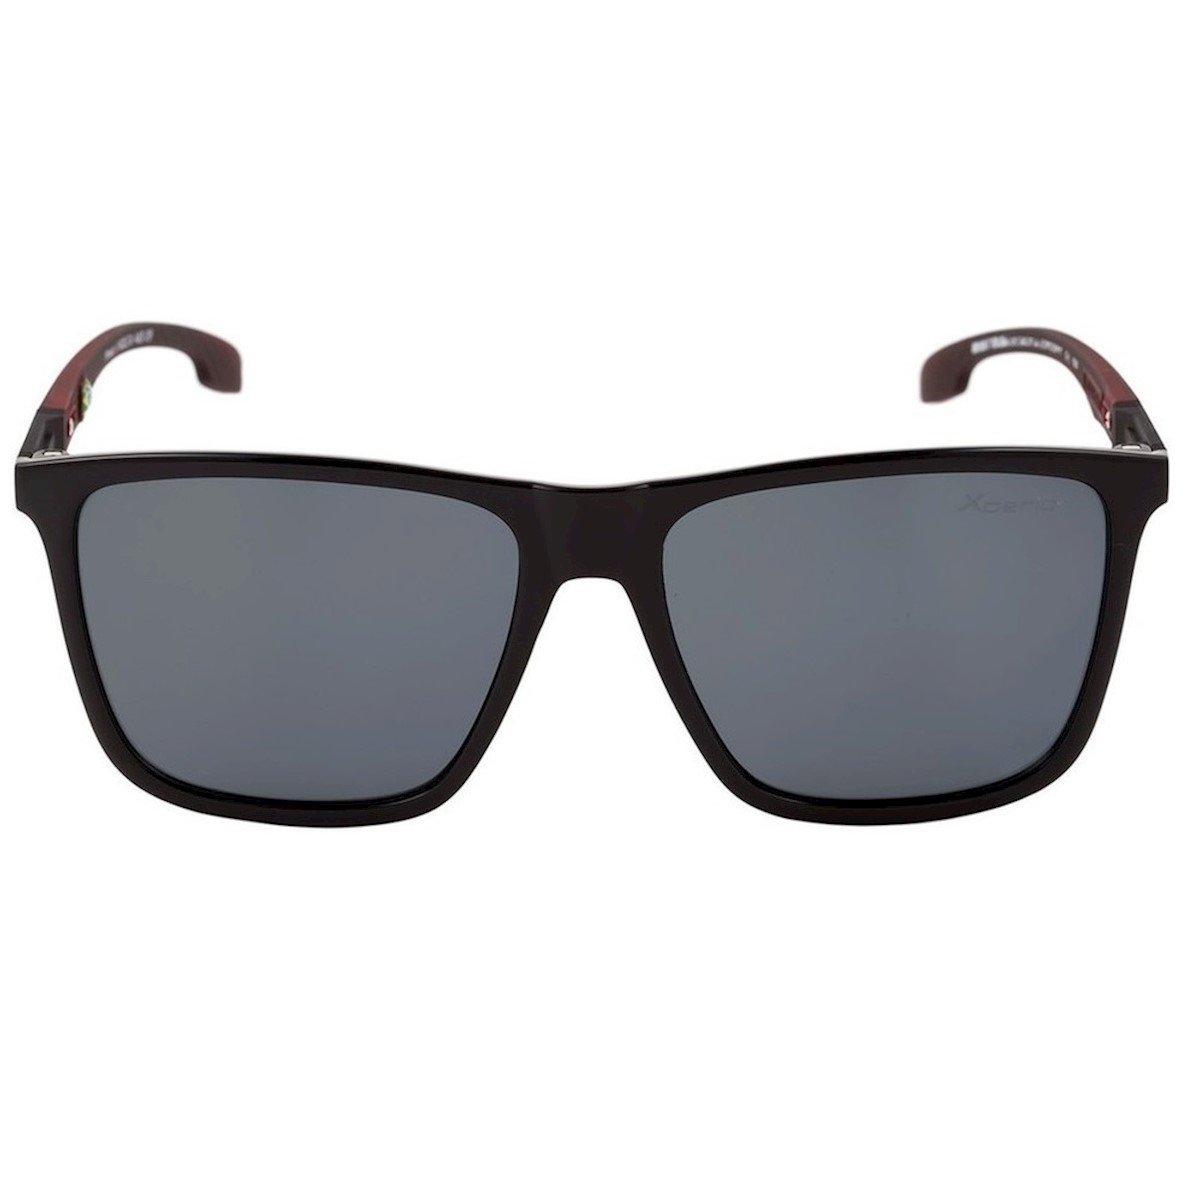 efd9aebf81e66 Óculos de Sol Mormaii Hawaii Polarizado Brilho - Compre Agora